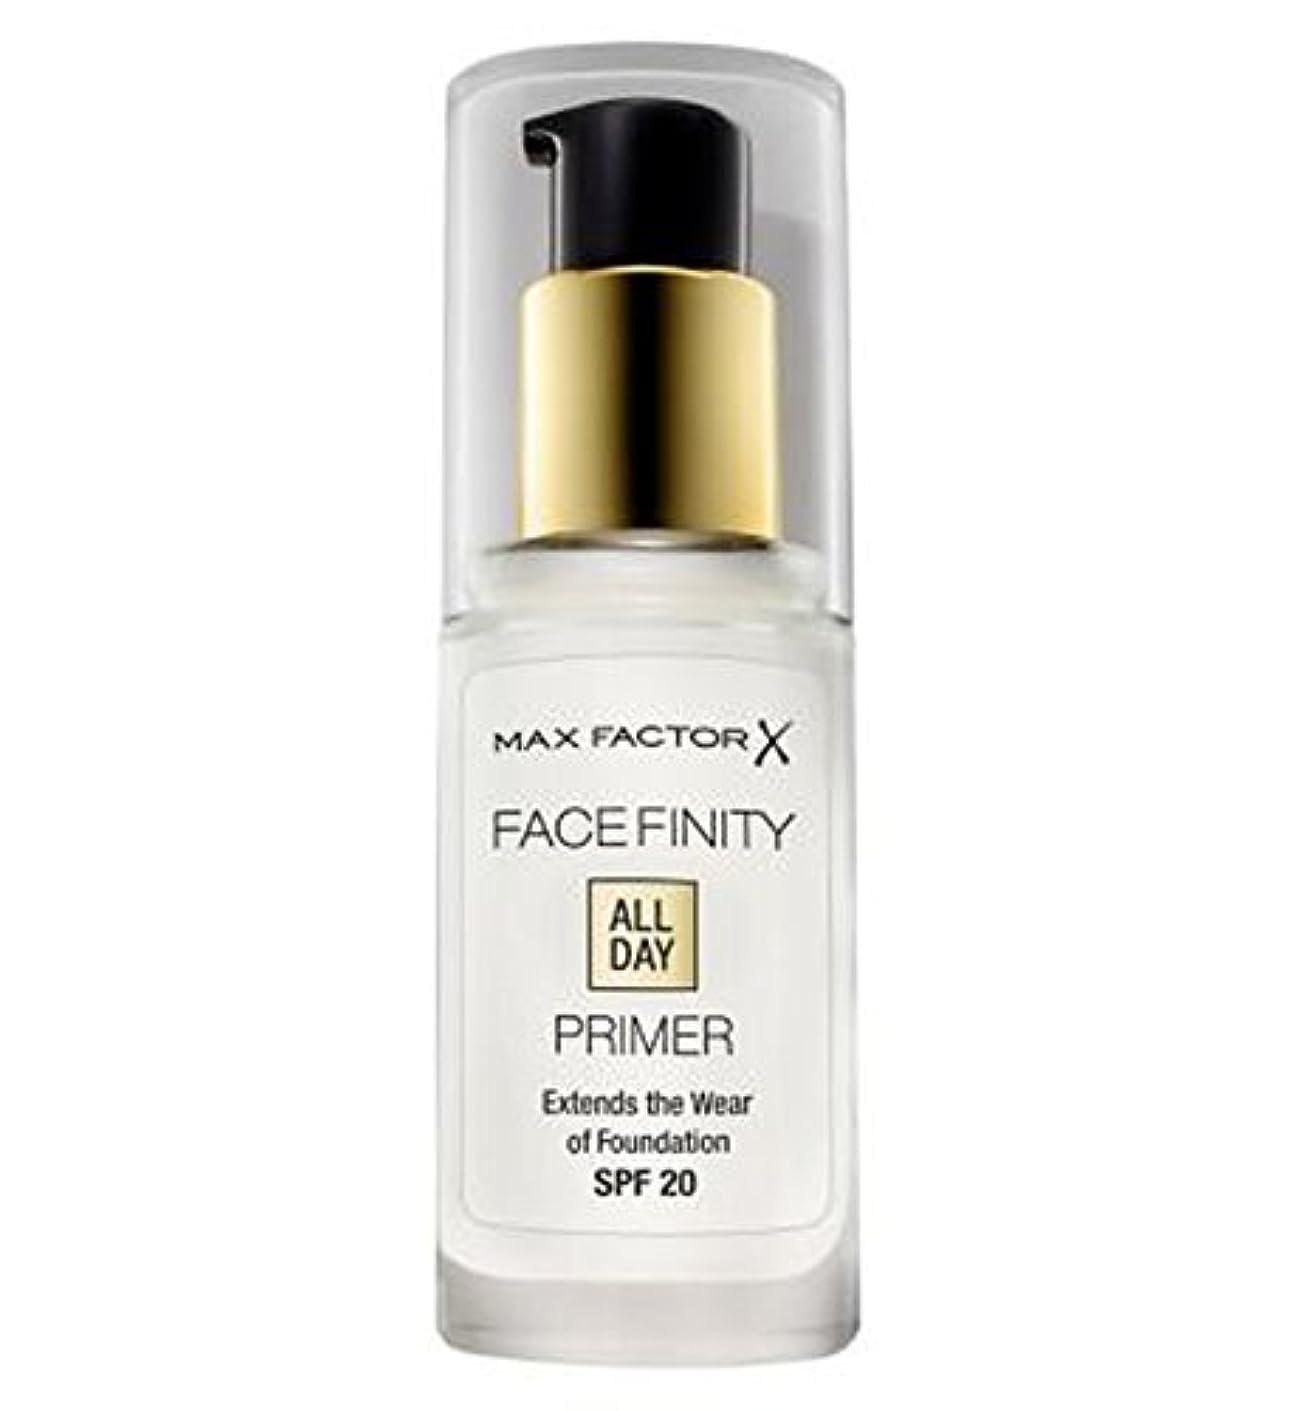 Max Factor Facefinity All Day Primer - マックスファクターのFacefinity終日プライマー (Max Factor) [並行輸入品]